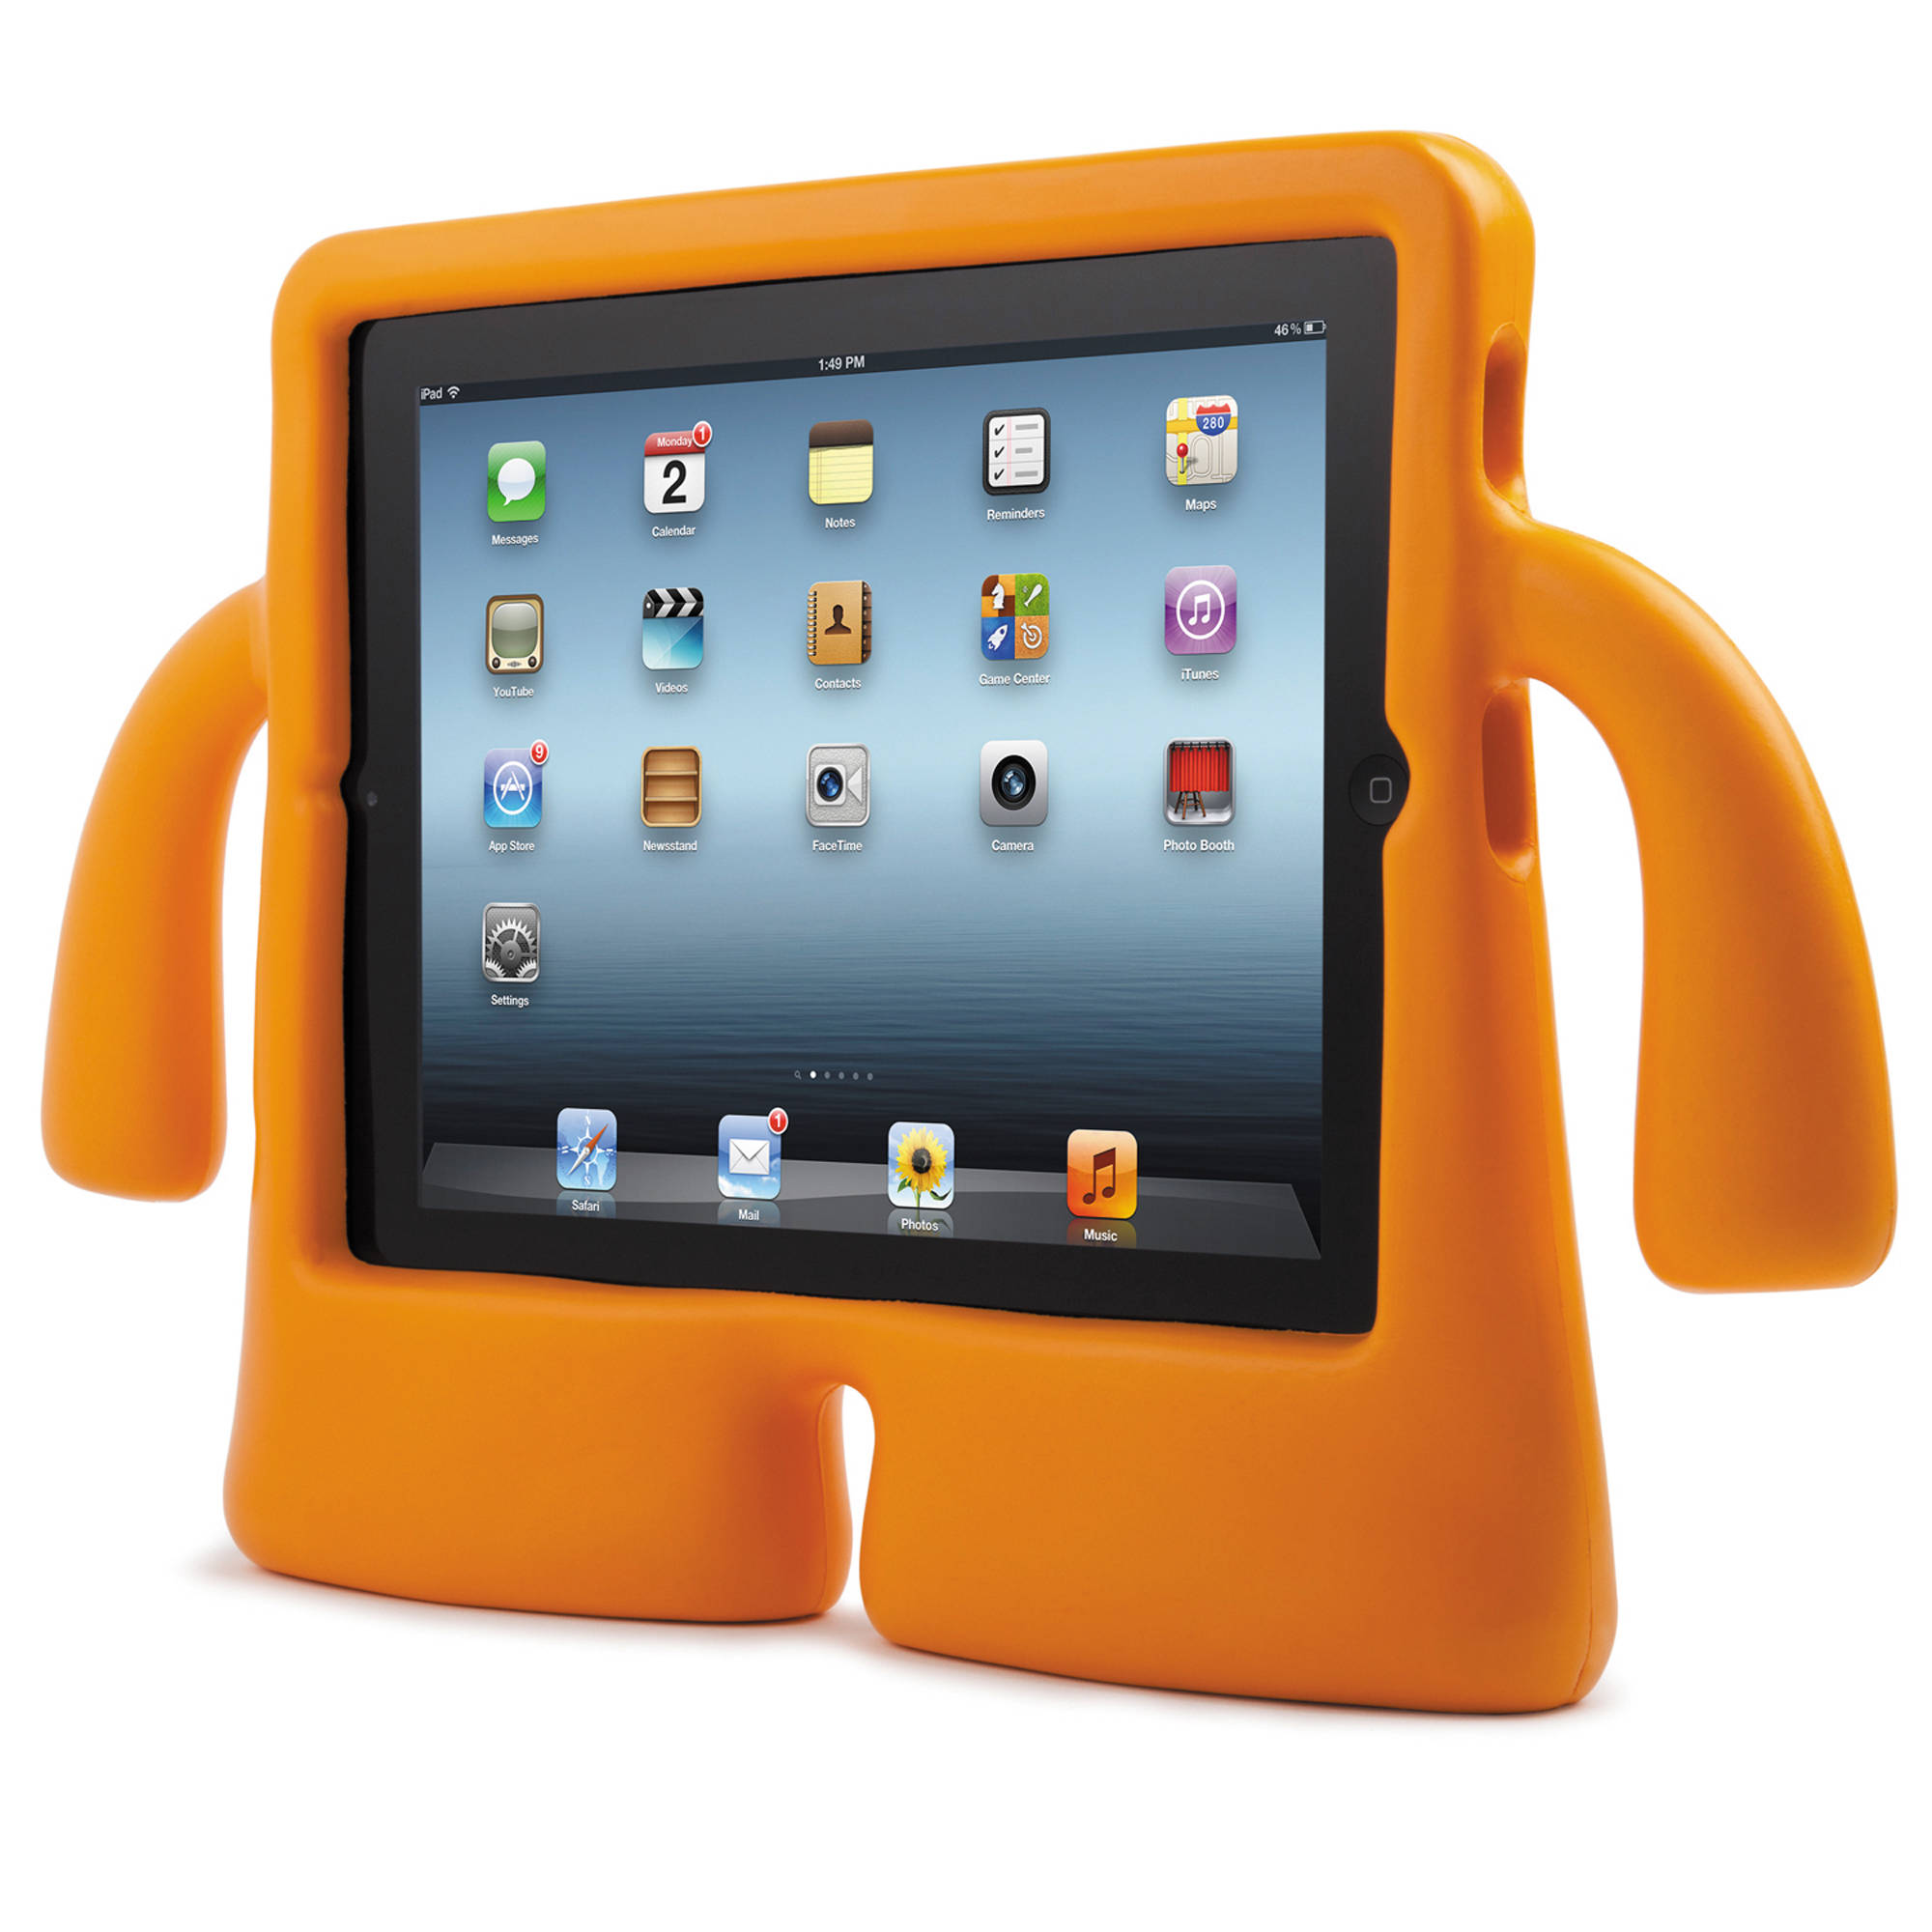 new concept 55e53 e8bda Speck iGuy Case for iPad 2/3/4 (Mango)